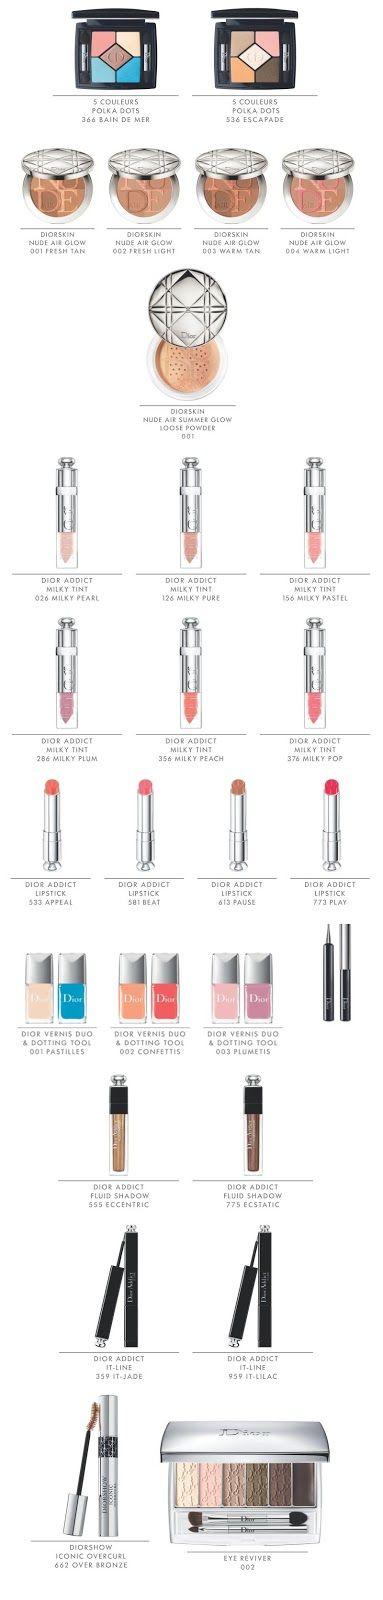 MacKarrie Beauty-Style Blog: Dior Milky Dots Summer 2016